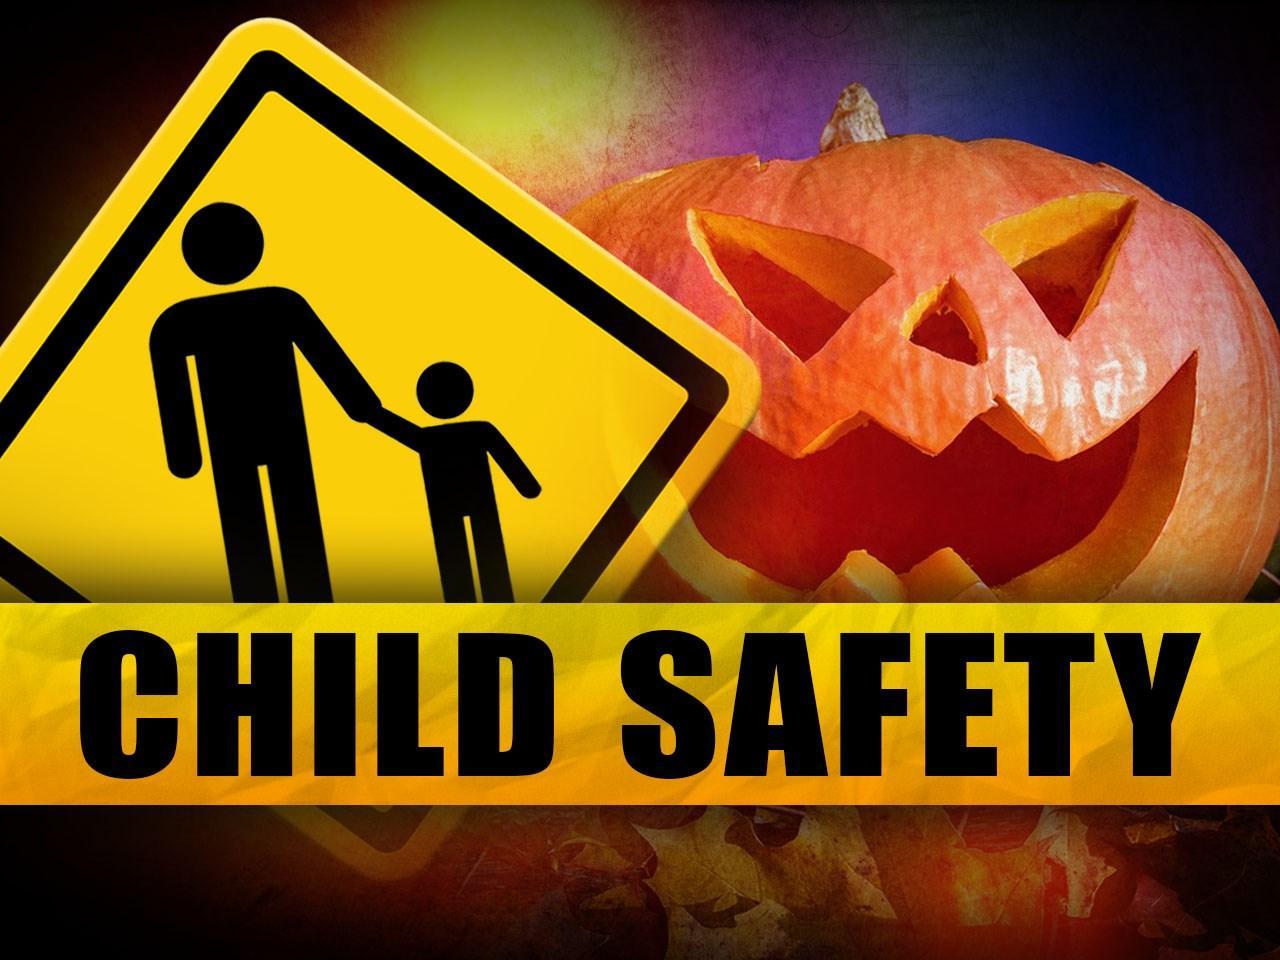 Halloween Safety_1540938085804.JPG.jpg